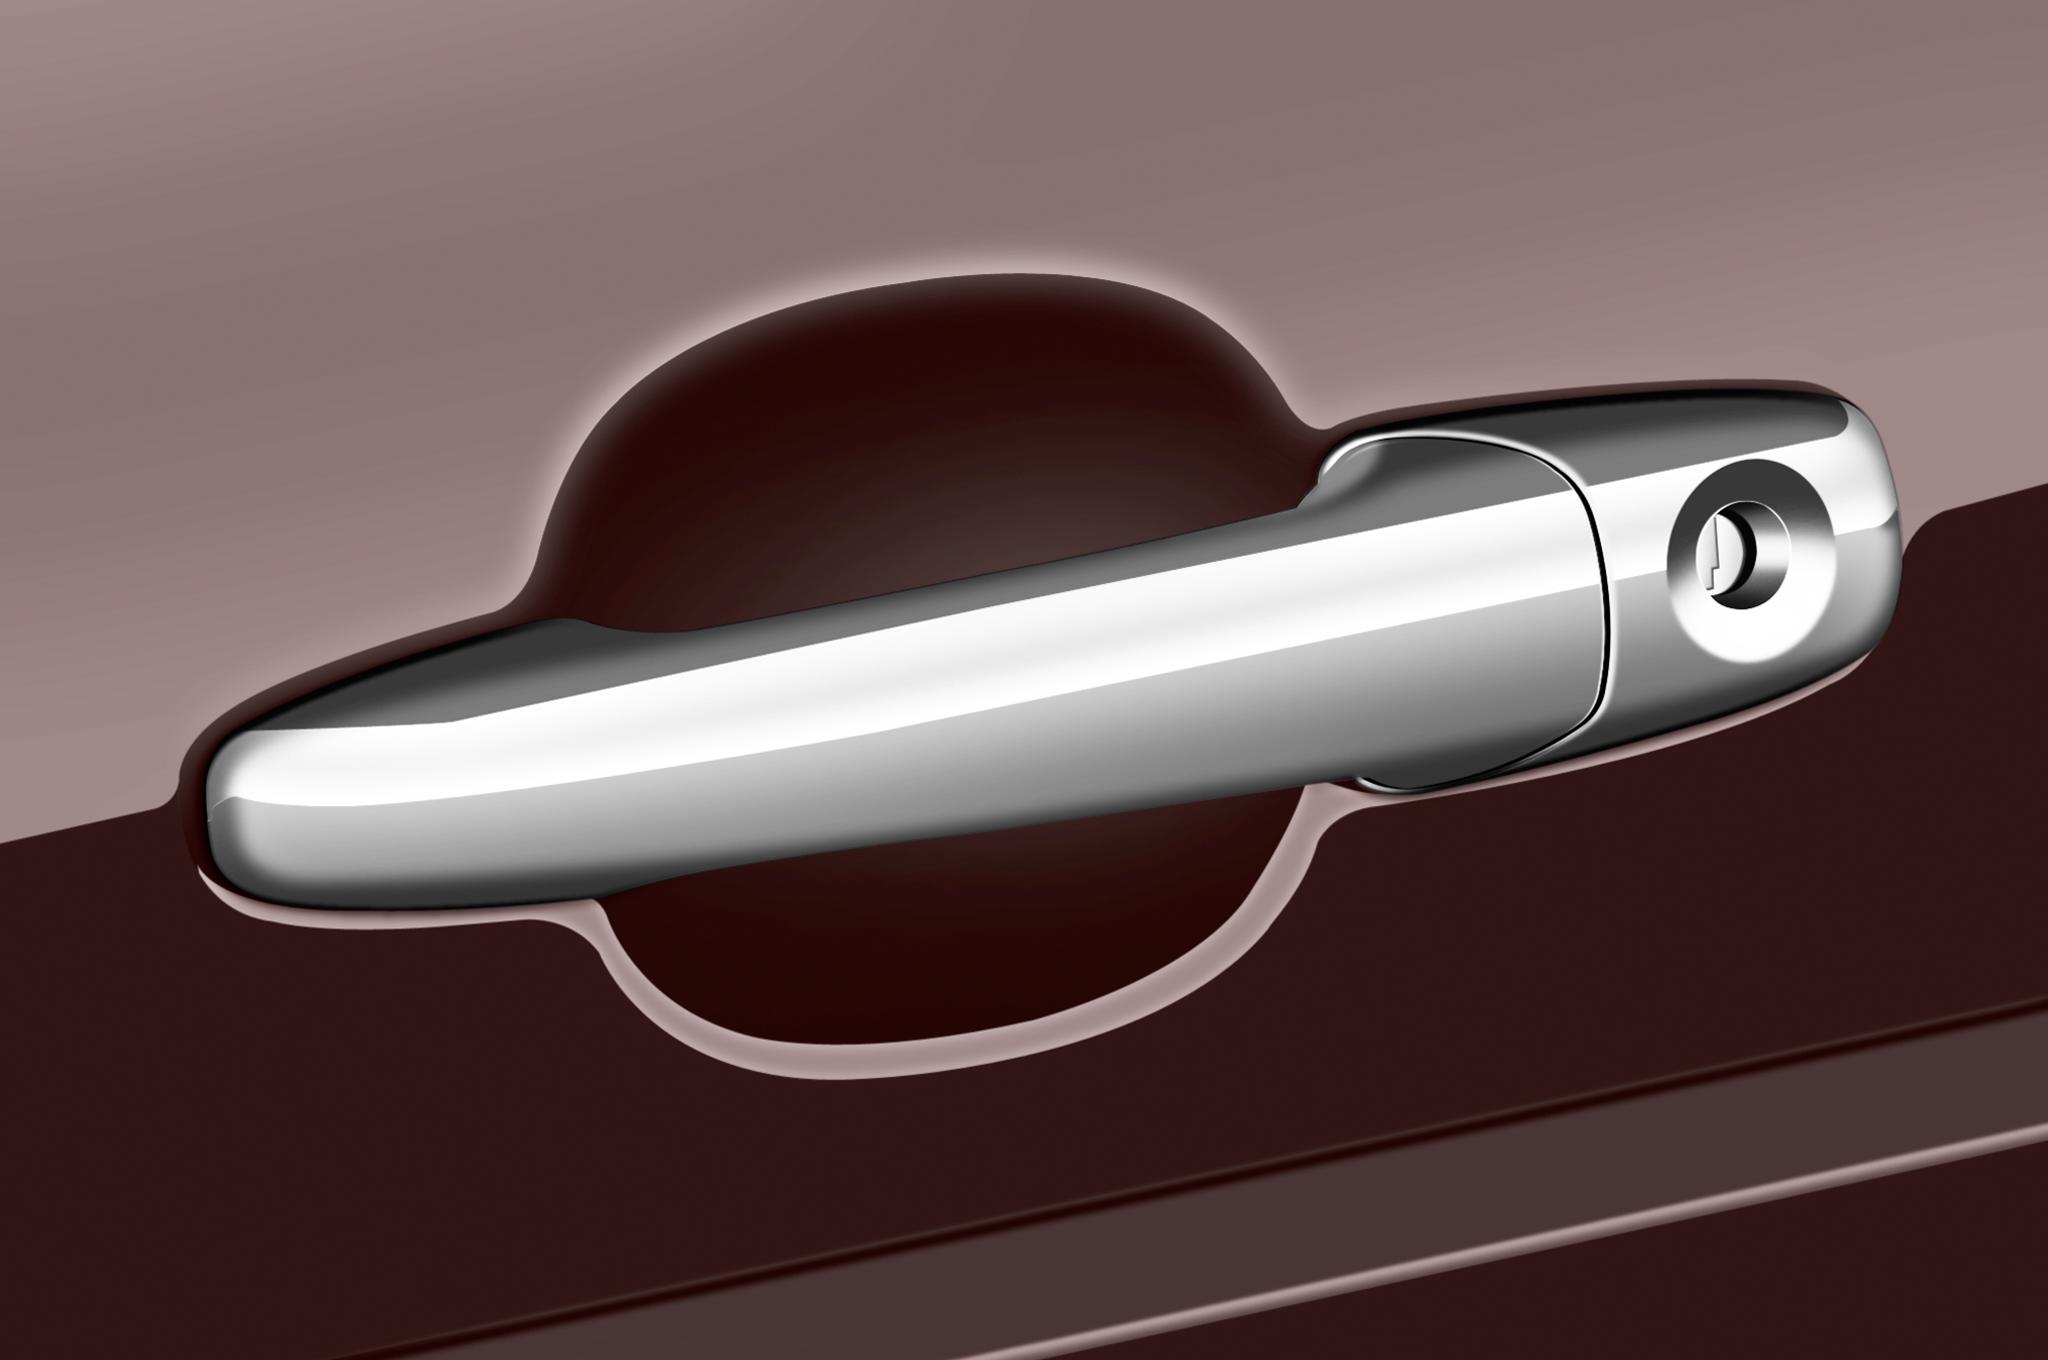 service manual 2013 ford flex door handle repair guide. Black Bedroom Furniture Sets. Home Design Ideas